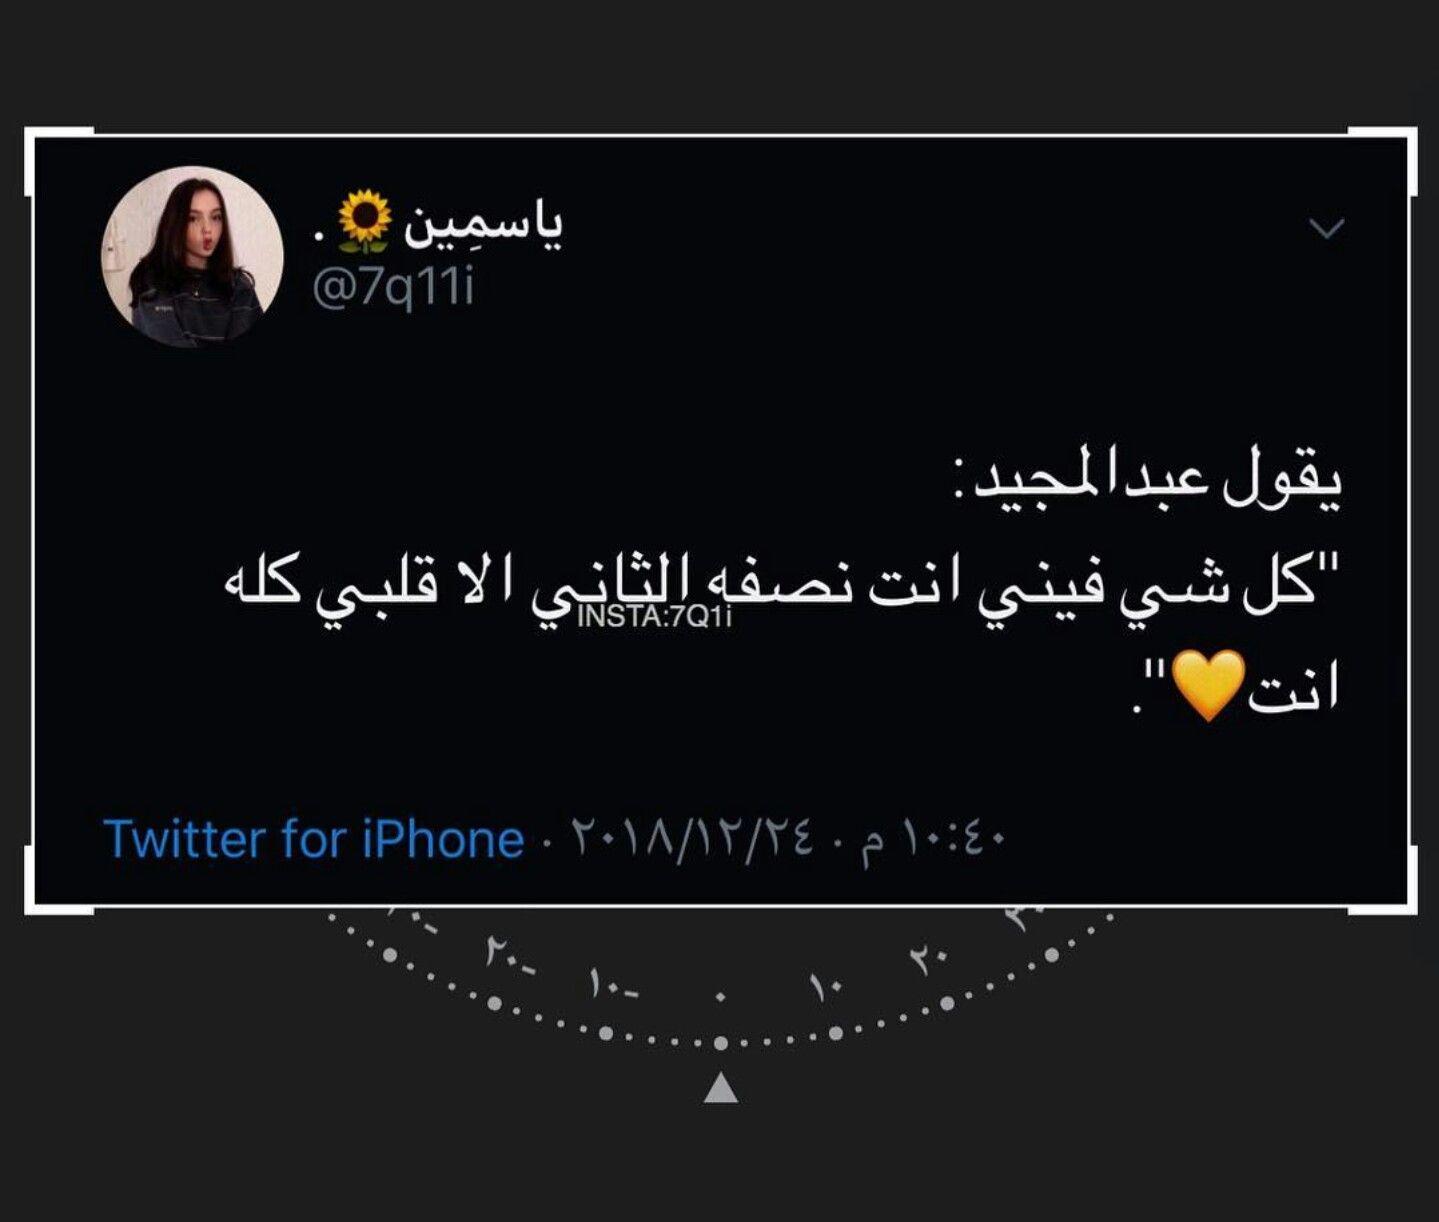 Pin By Nadine On هو الحب منو عشره ولا بيخلق بعد فتره Love Photos Romantic Quotes Arabic Jokes